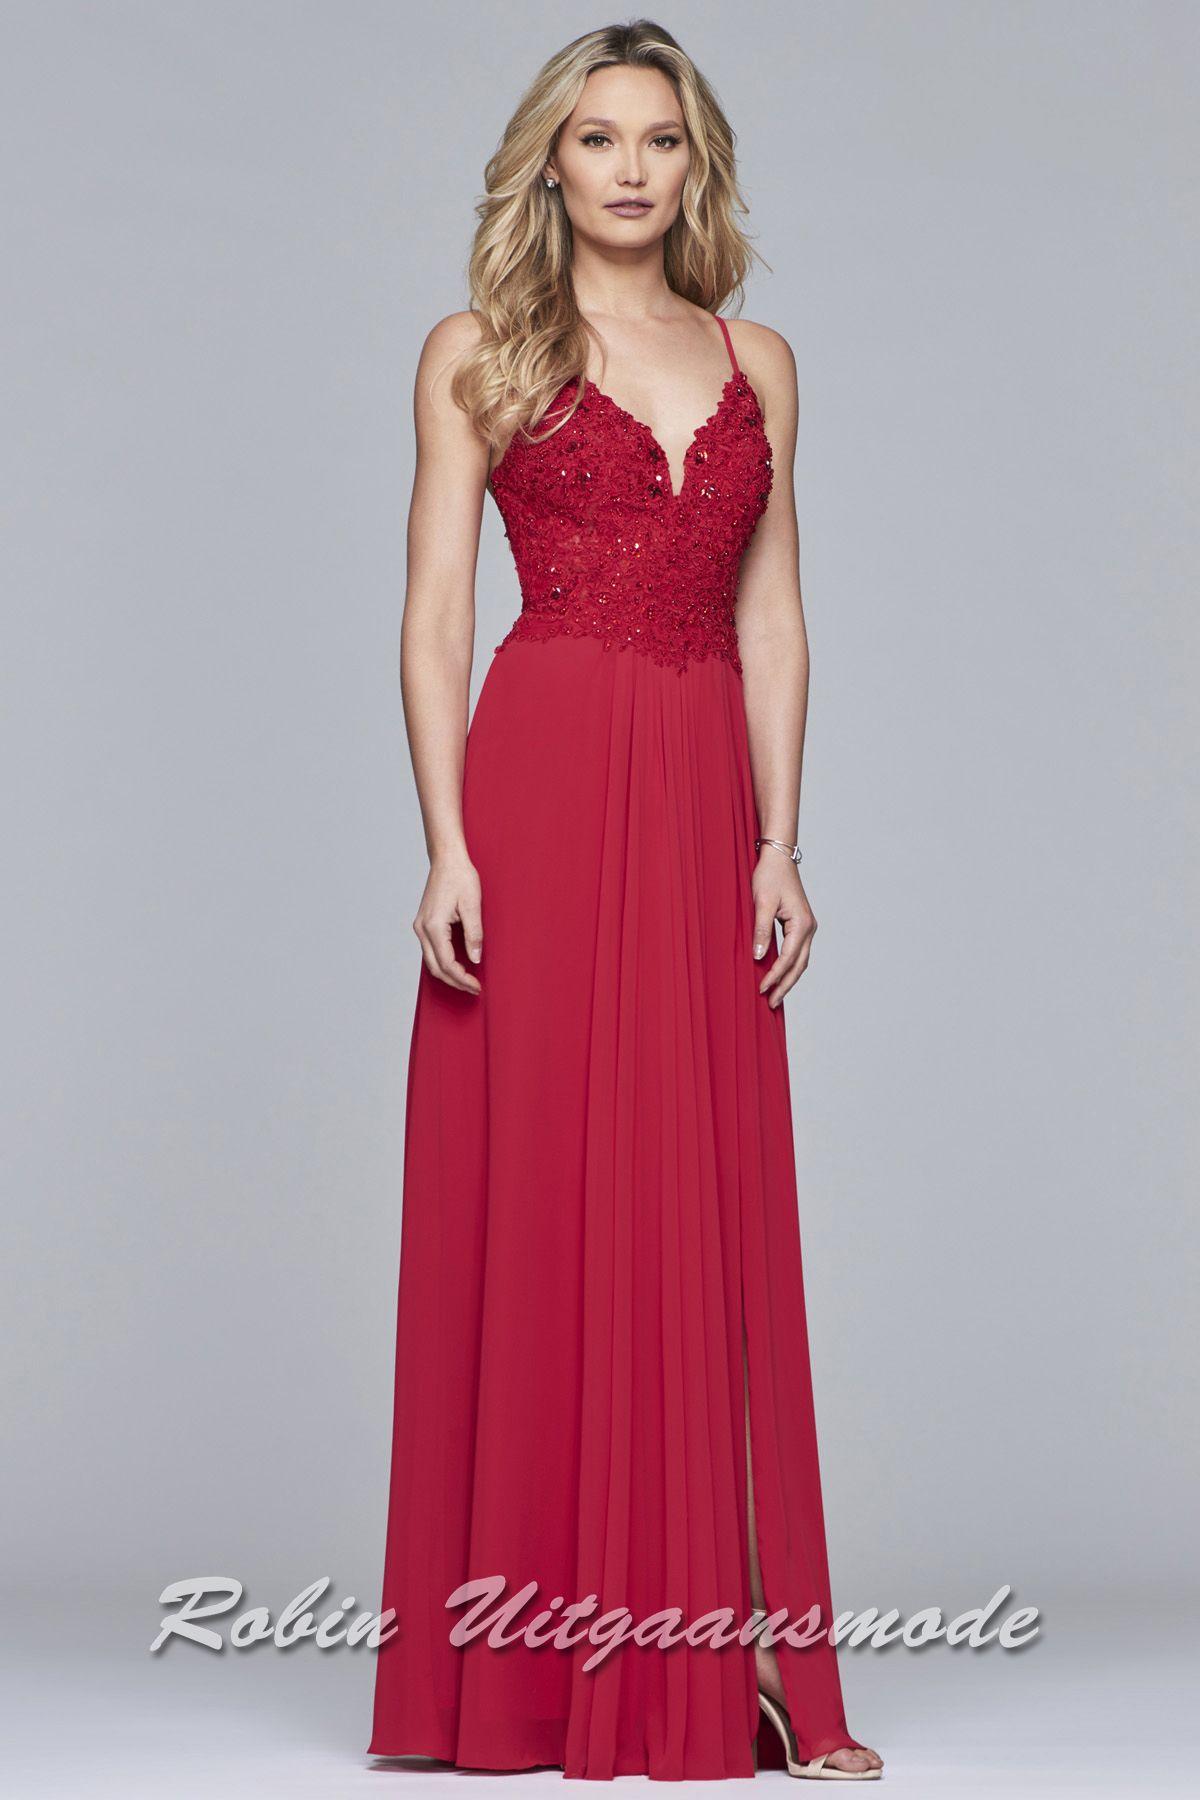 7d4401ae21f92d Rode gala jurk